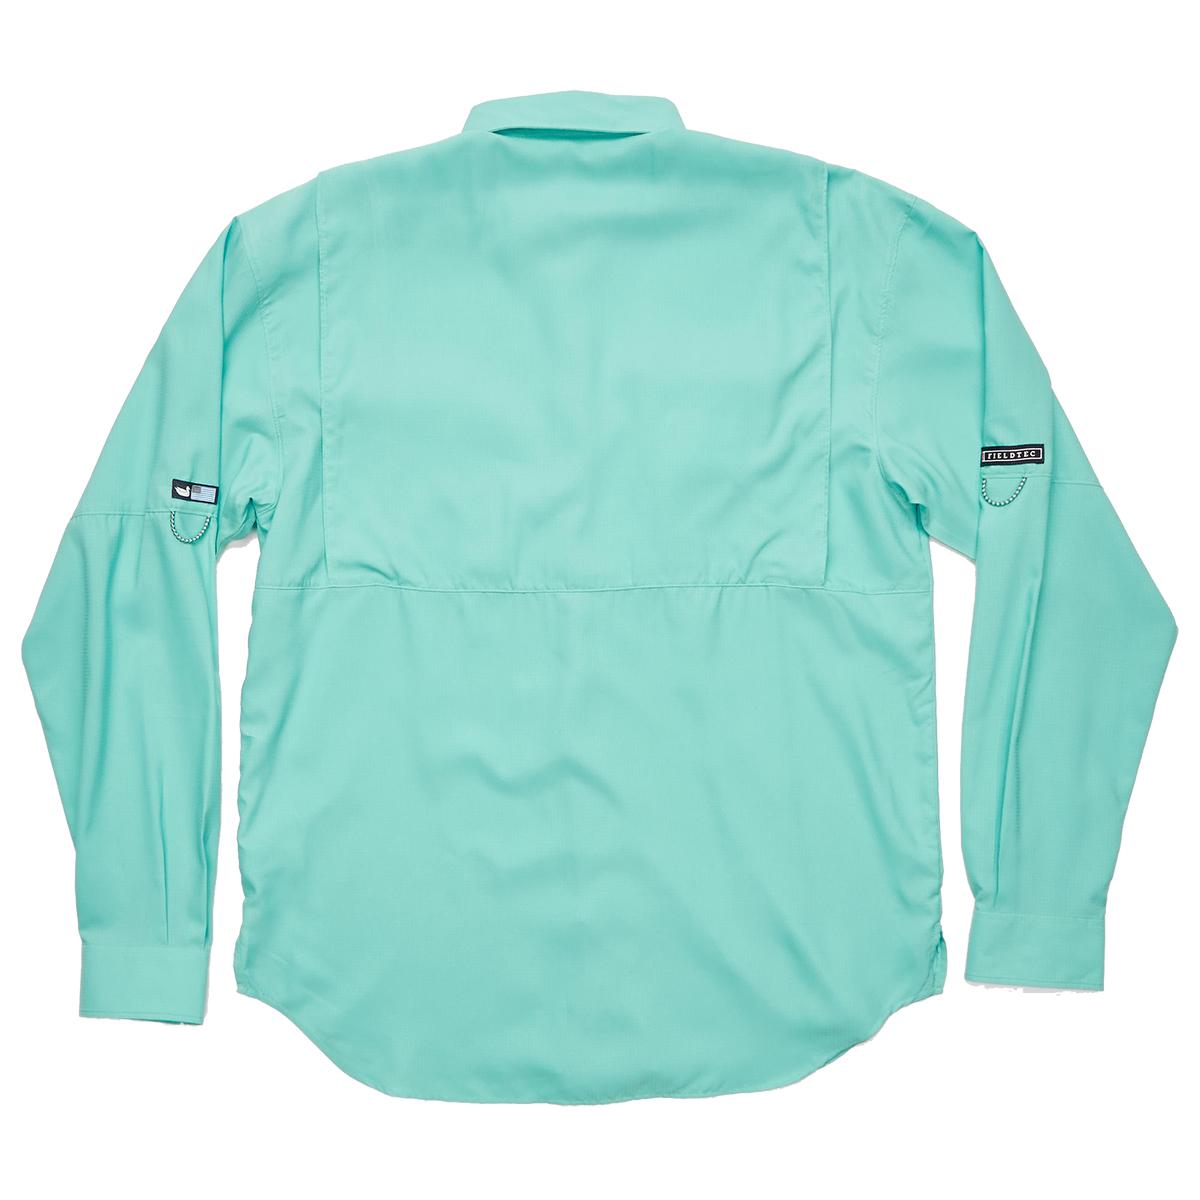 Southern marsh harbor cay long sleeve fishing shirts ebay for Southern marsh dress shirts on sale